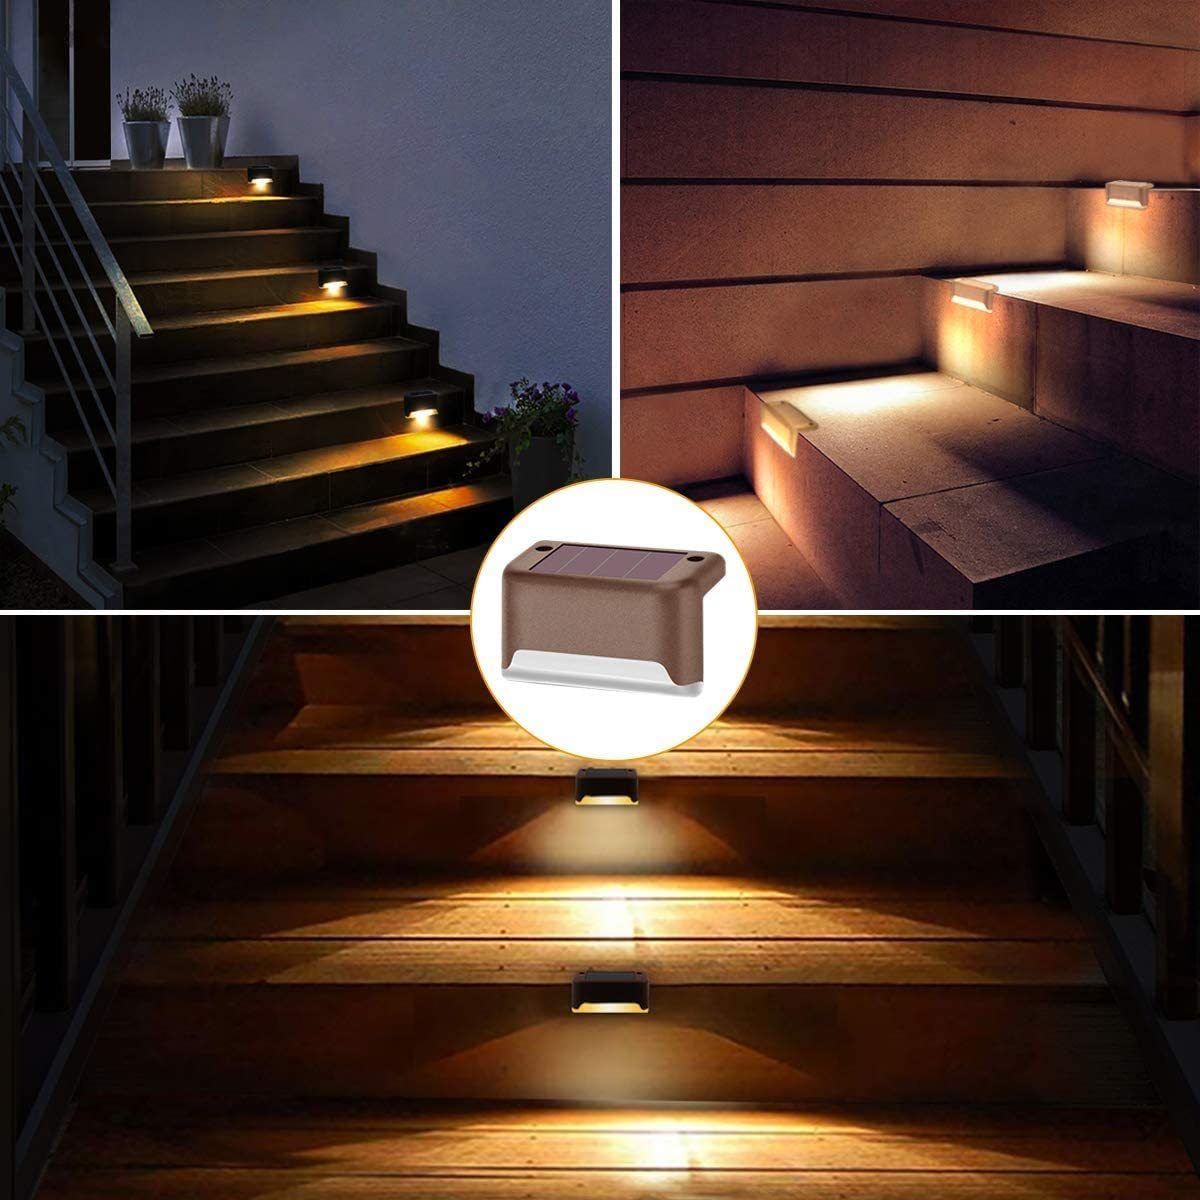 swonuk Luces de Cubierta Solar ,8 Piezas Resistente al Agua LED Luz de Escaleras Solar Lámpara Exterior Luces Deck Solares Exterior para Terraza, Paso, Camino, Escaleras, Patio ,Cercas: Amazon.es: Electrónica